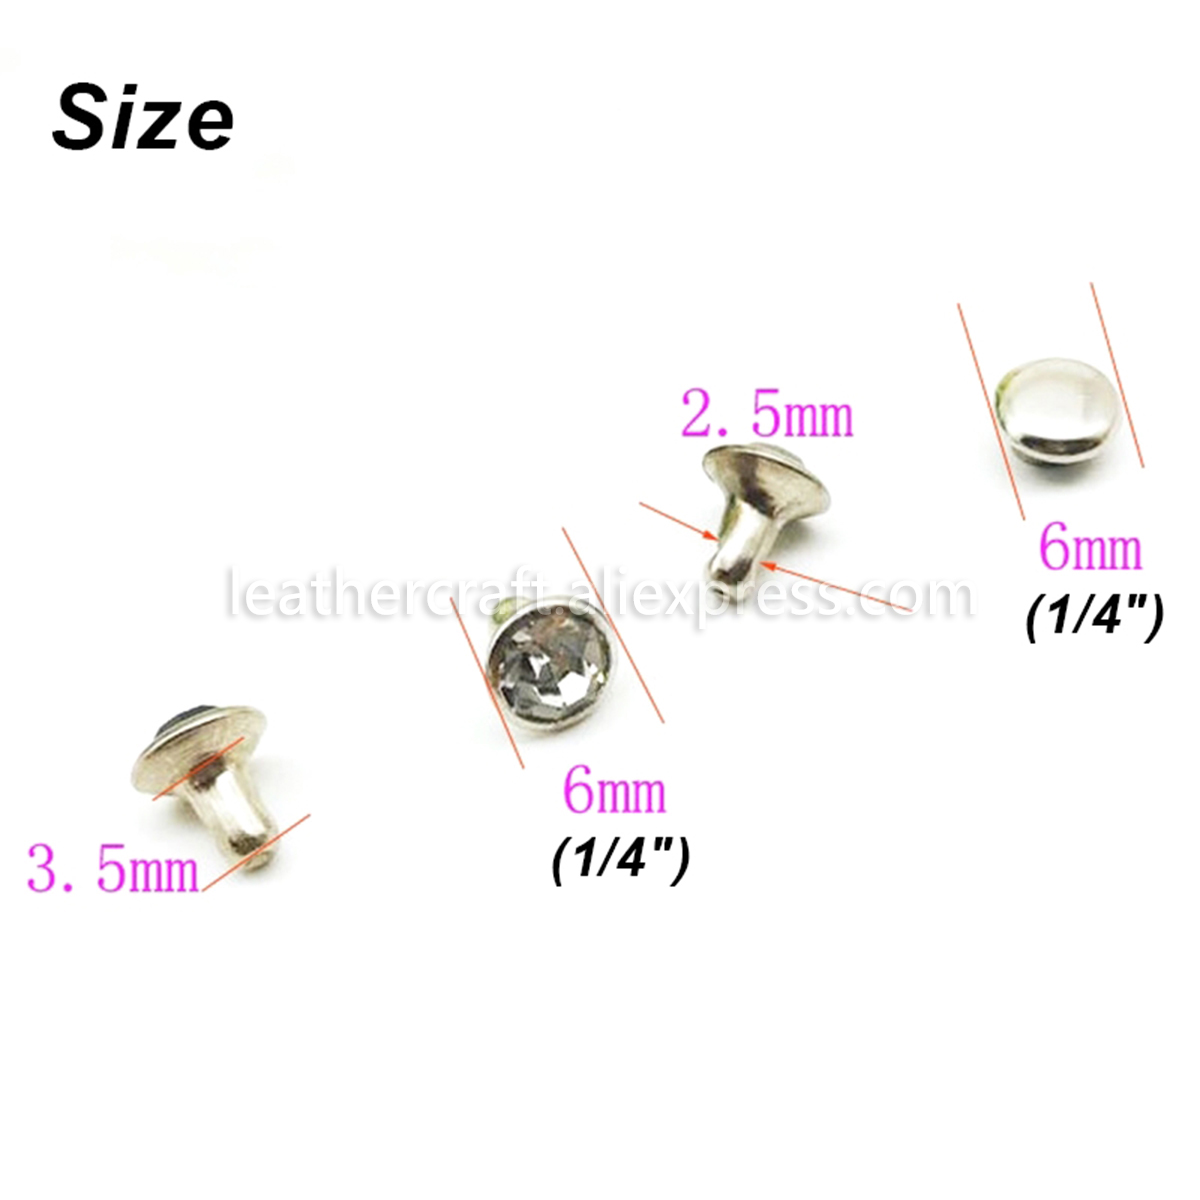 6mm Black Gem crystal Rivet Studs,Single Cap Marble Synthetic rivets,Fashion Studs leather Purse Decoration rivets,handbag rivets hardware